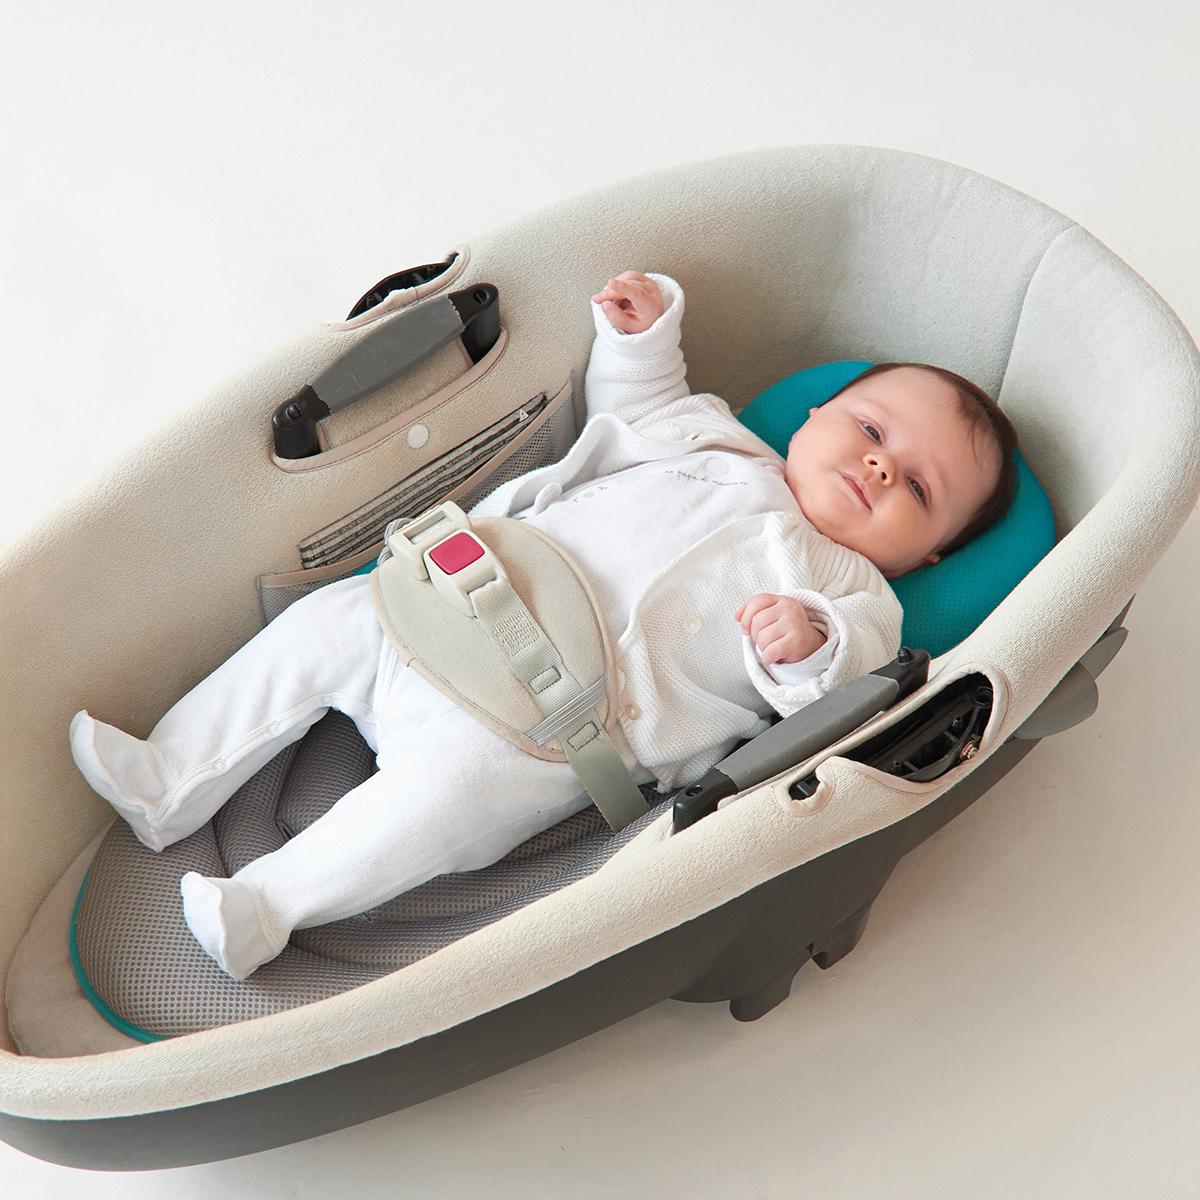 candide matelas baby pad air cale b b candide sur l. Black Bedroom Furniture Sets. Home Design Ideas